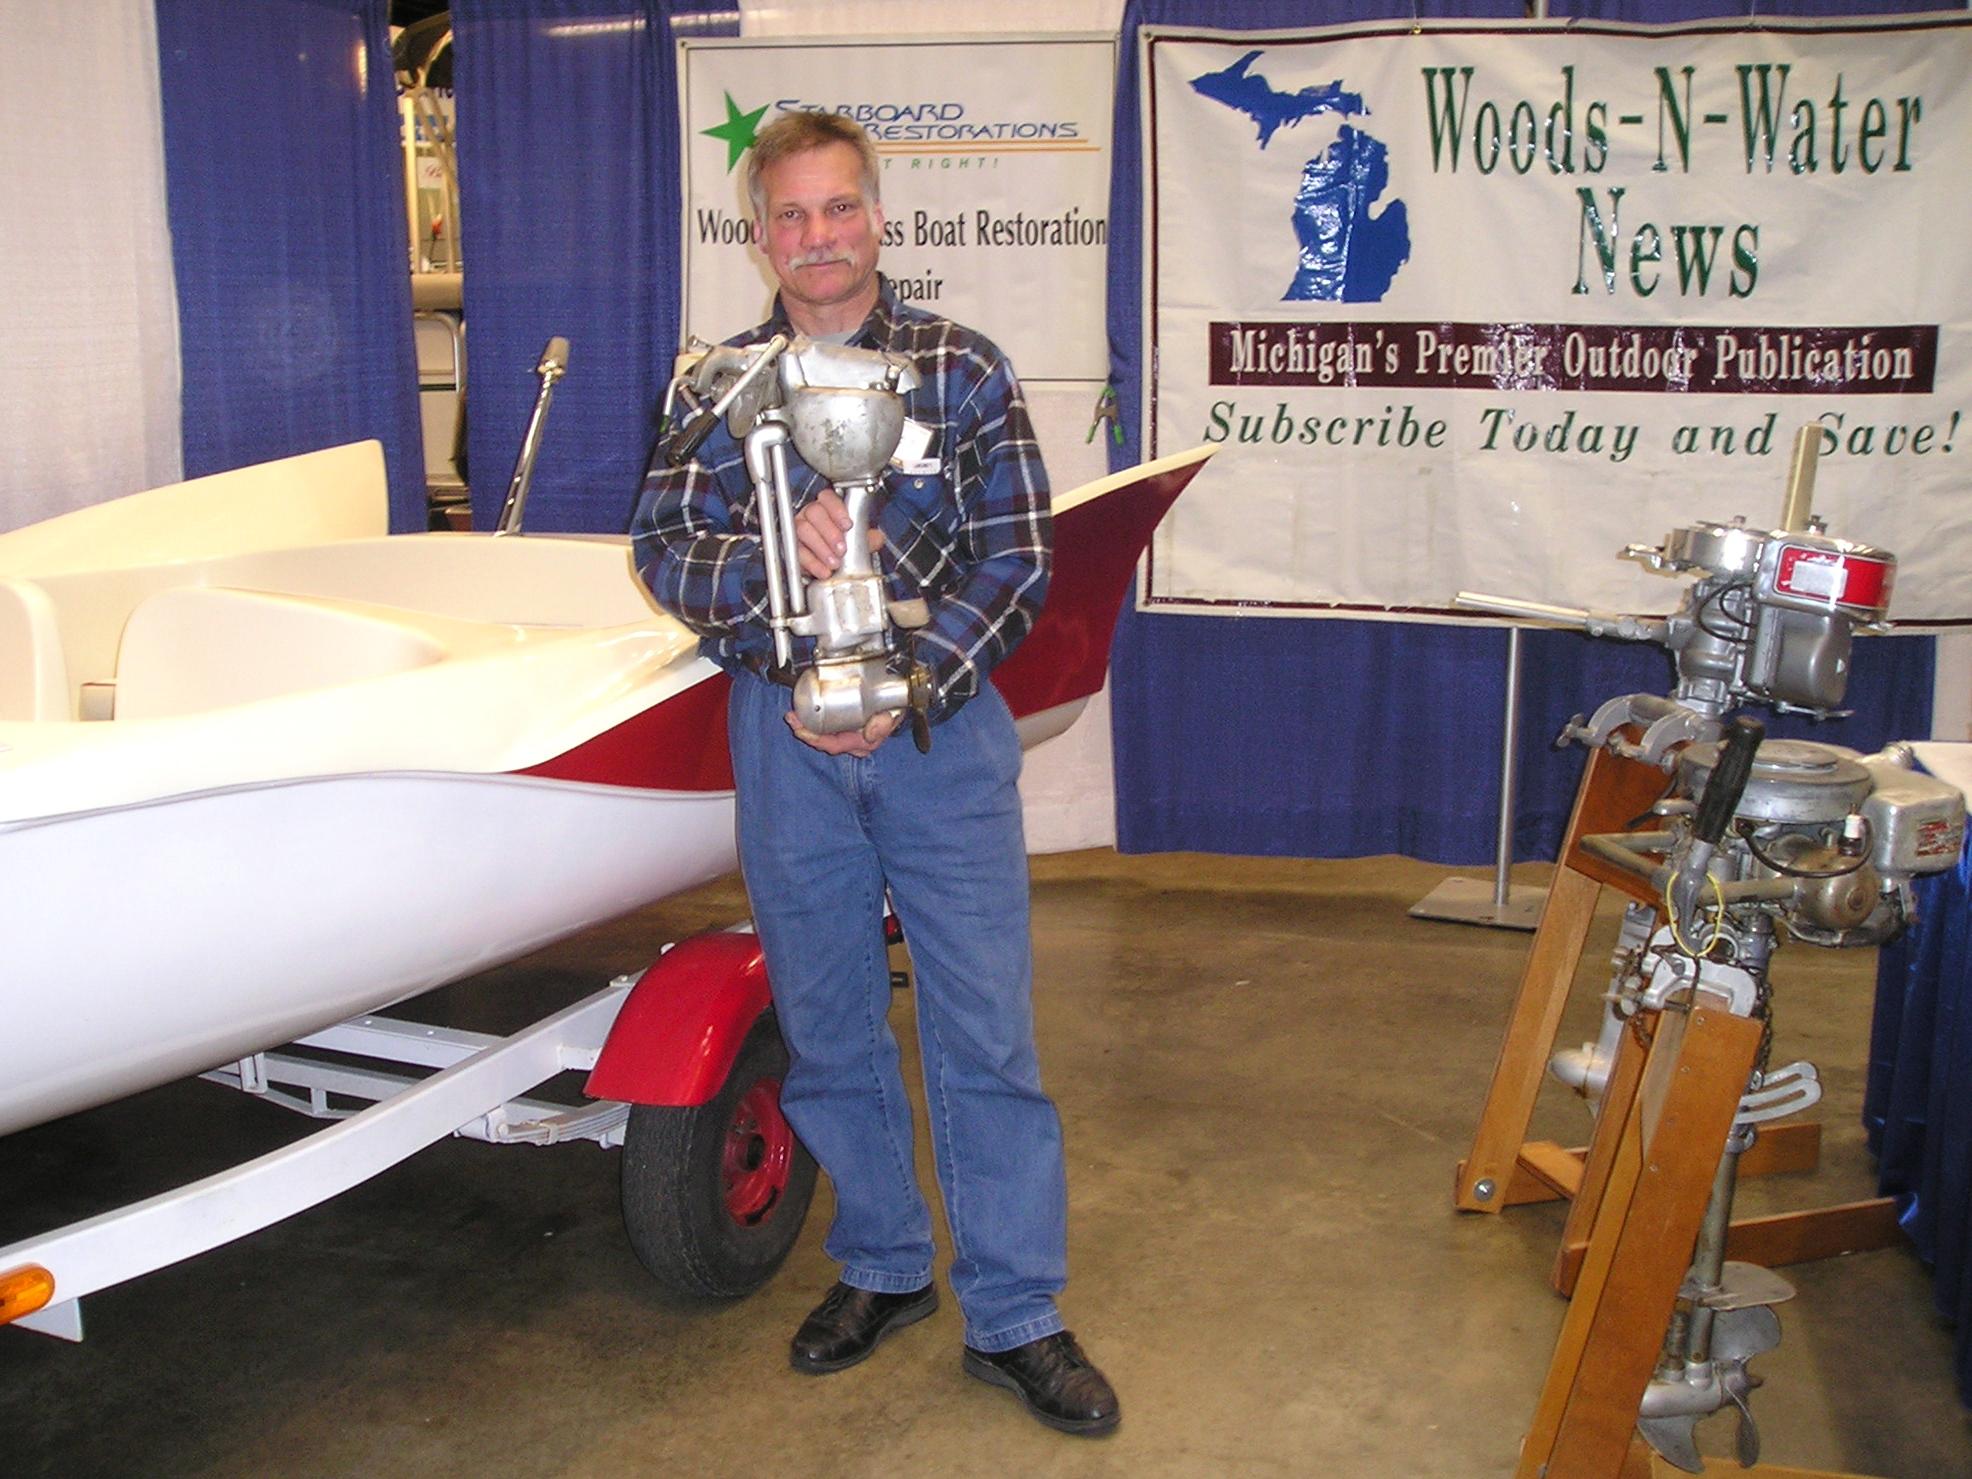 Vintage Boats & Outboard Motors